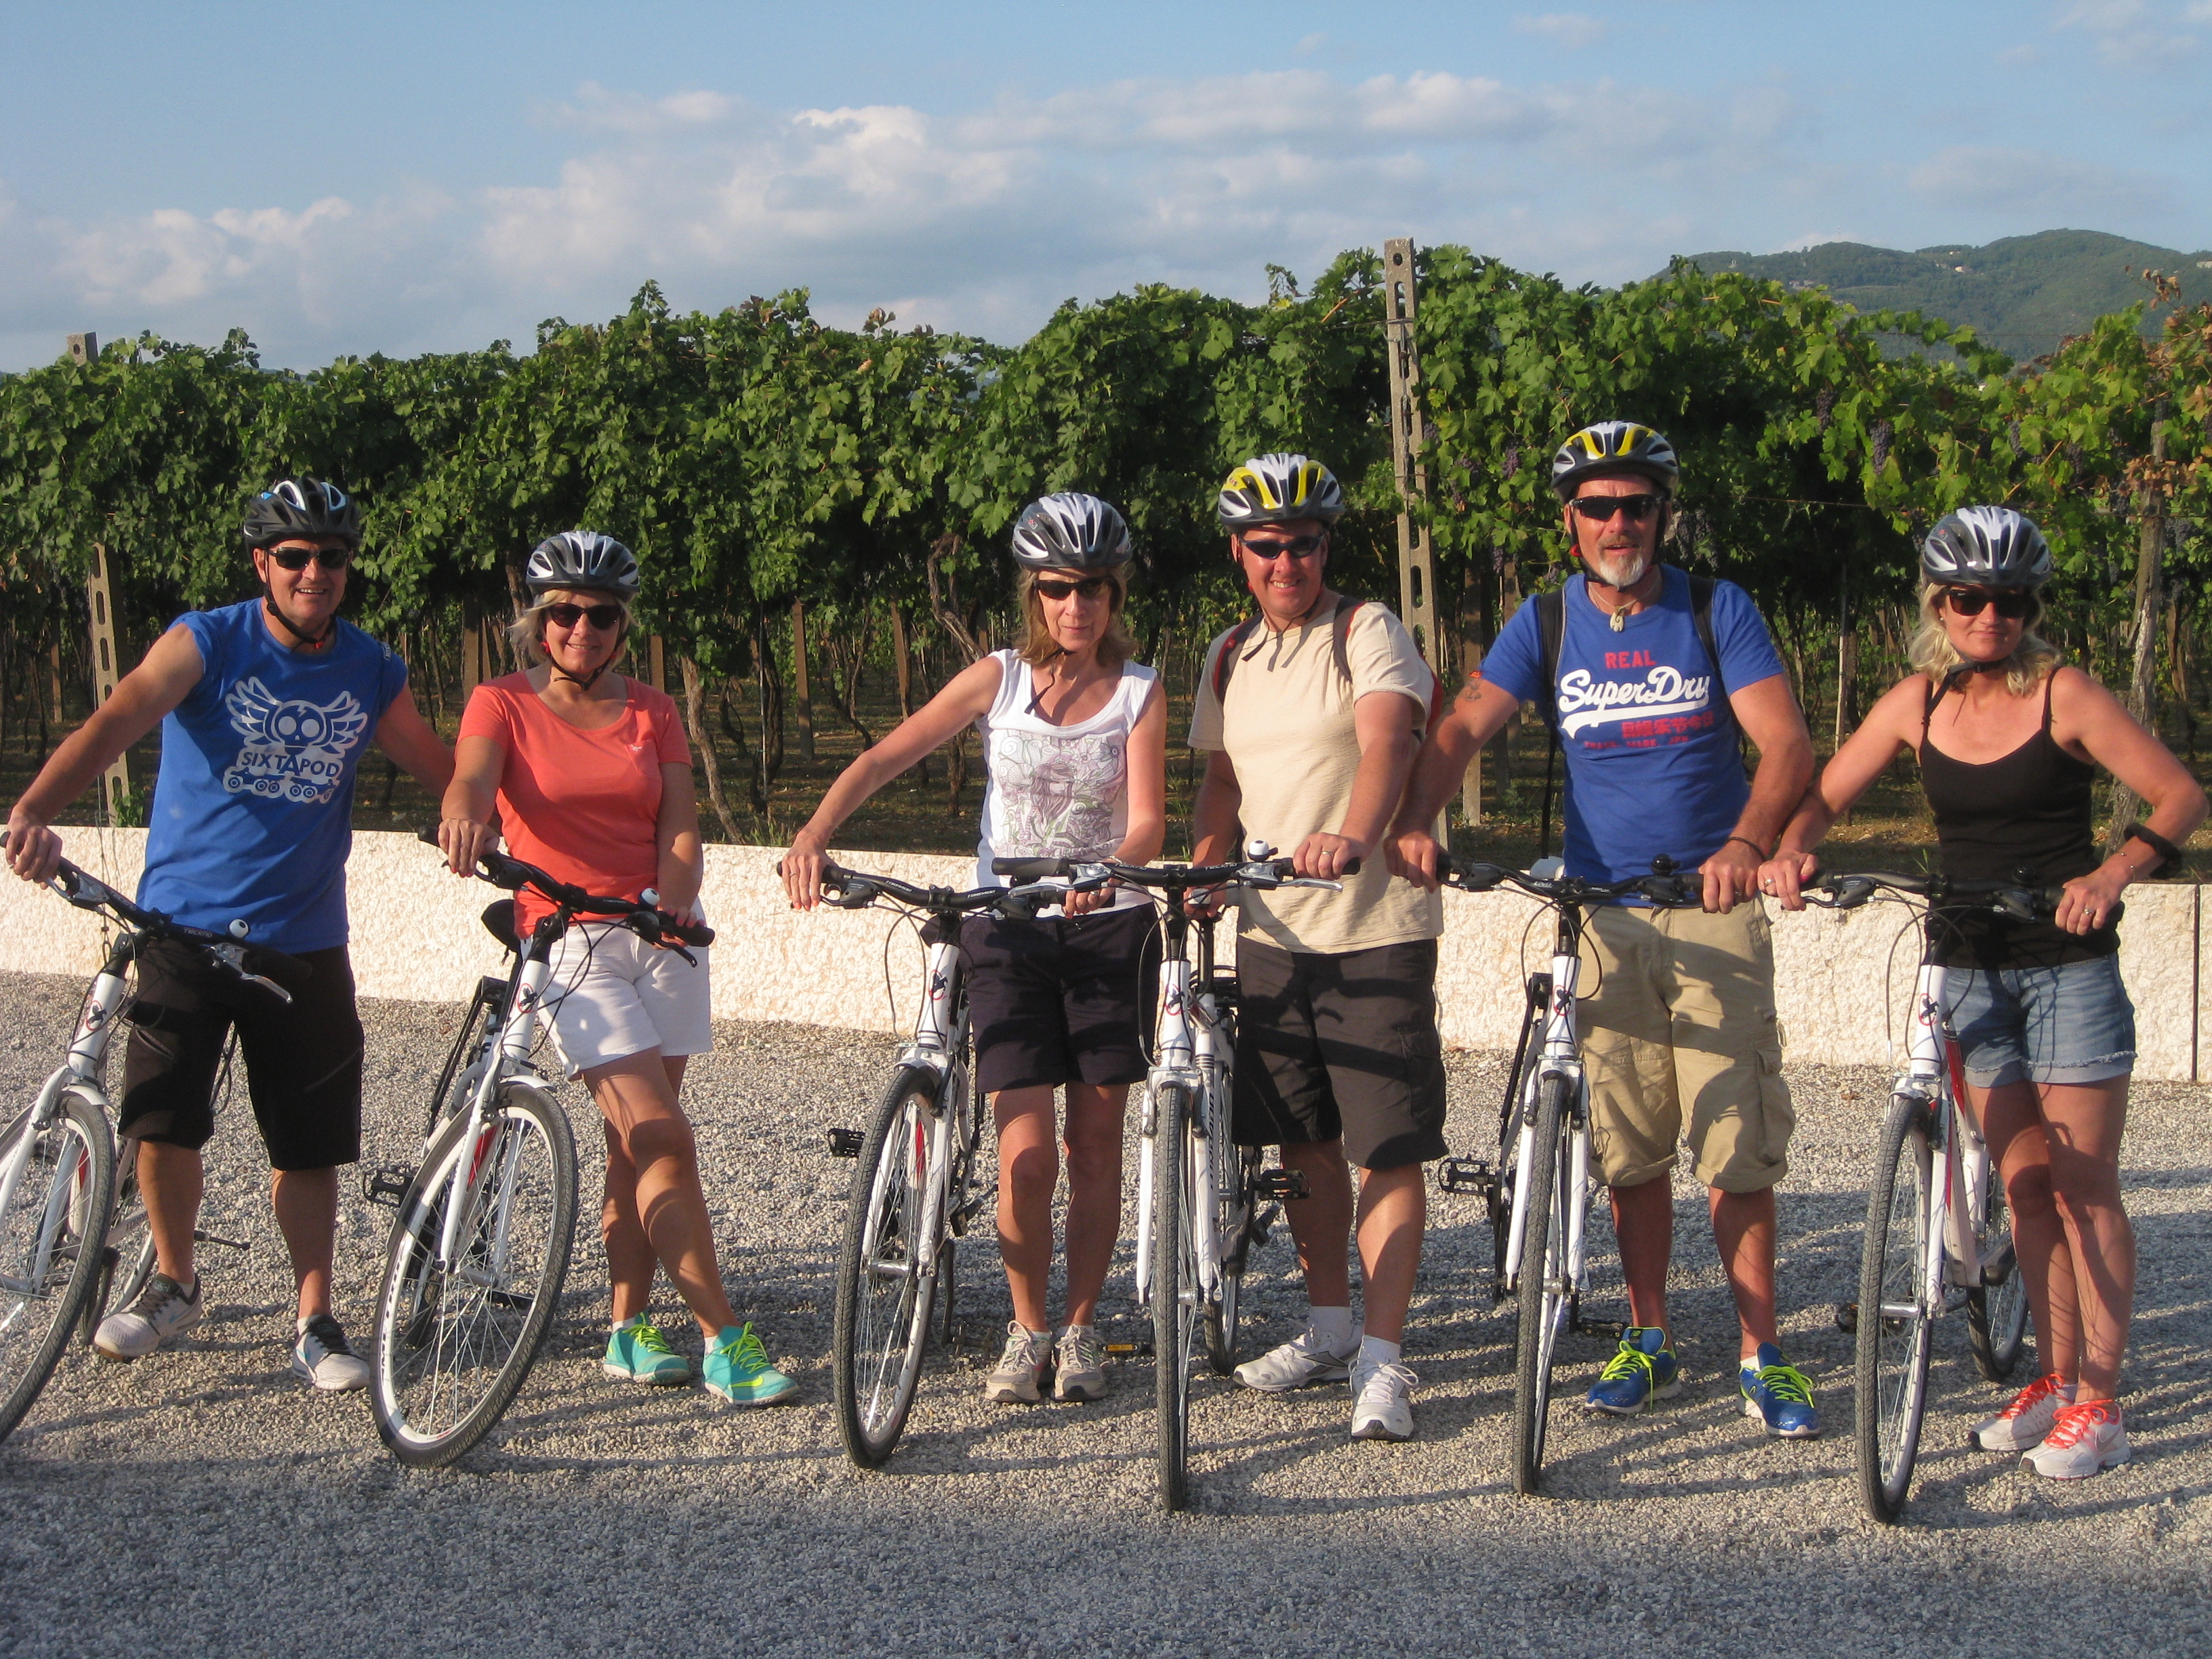 Valpolicella bike tour